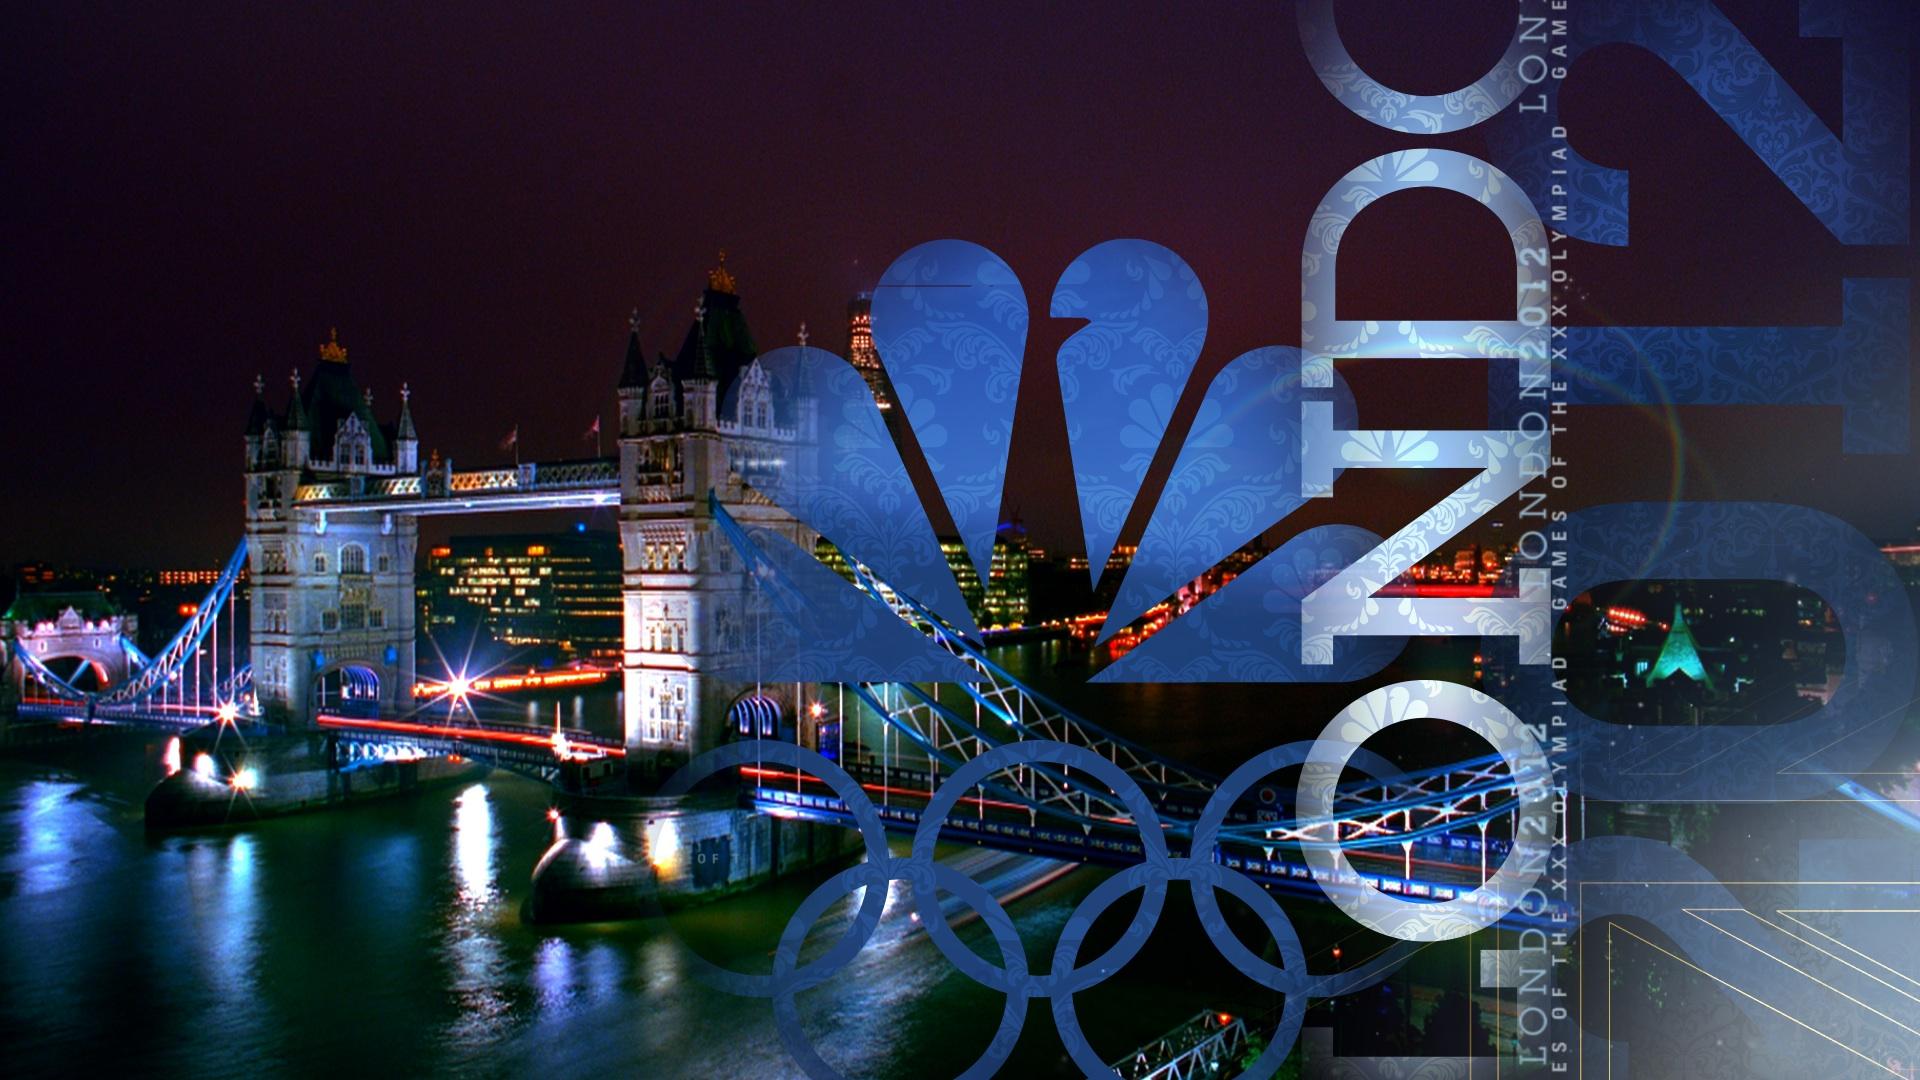 motion graphic design studio jonberrydesign | London 2012 Olympics